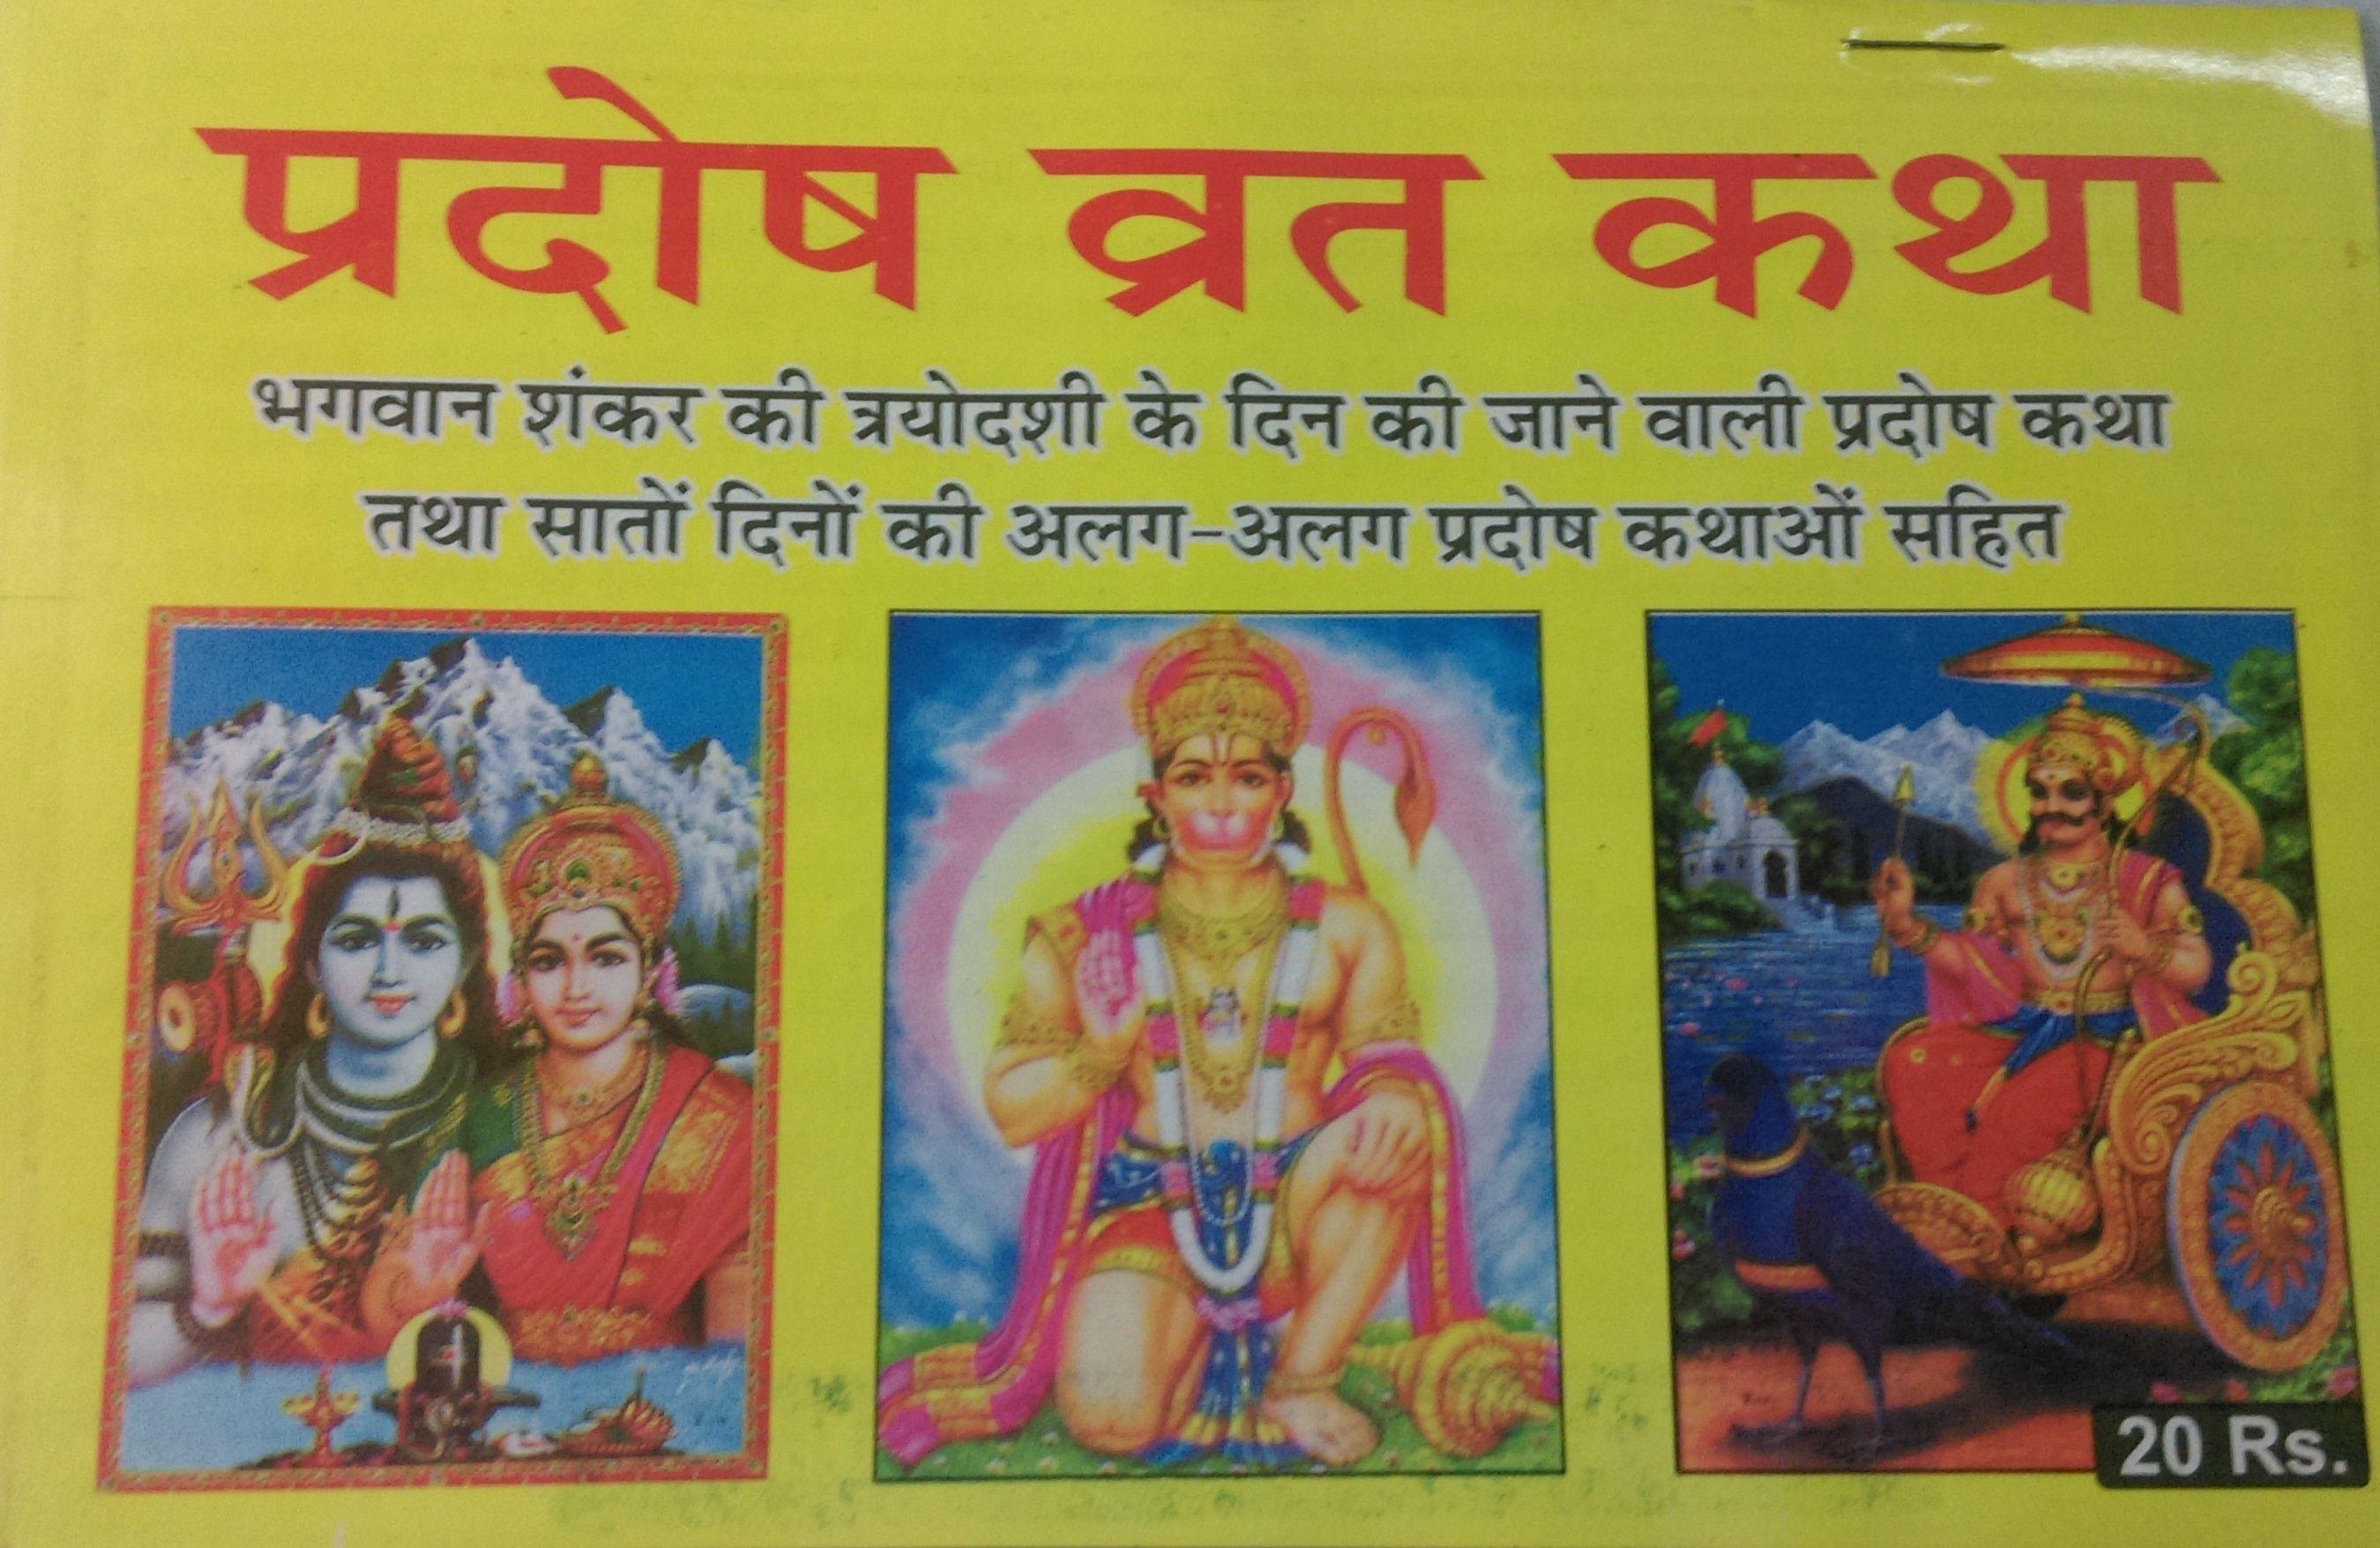 #PradoshVratKatha #PradoshVratKathaBook #PradoshVratKathaBooksOnline #PradoshVratKathaBookjalandhar  www.mahamayapublications.com Cont.98152-61575